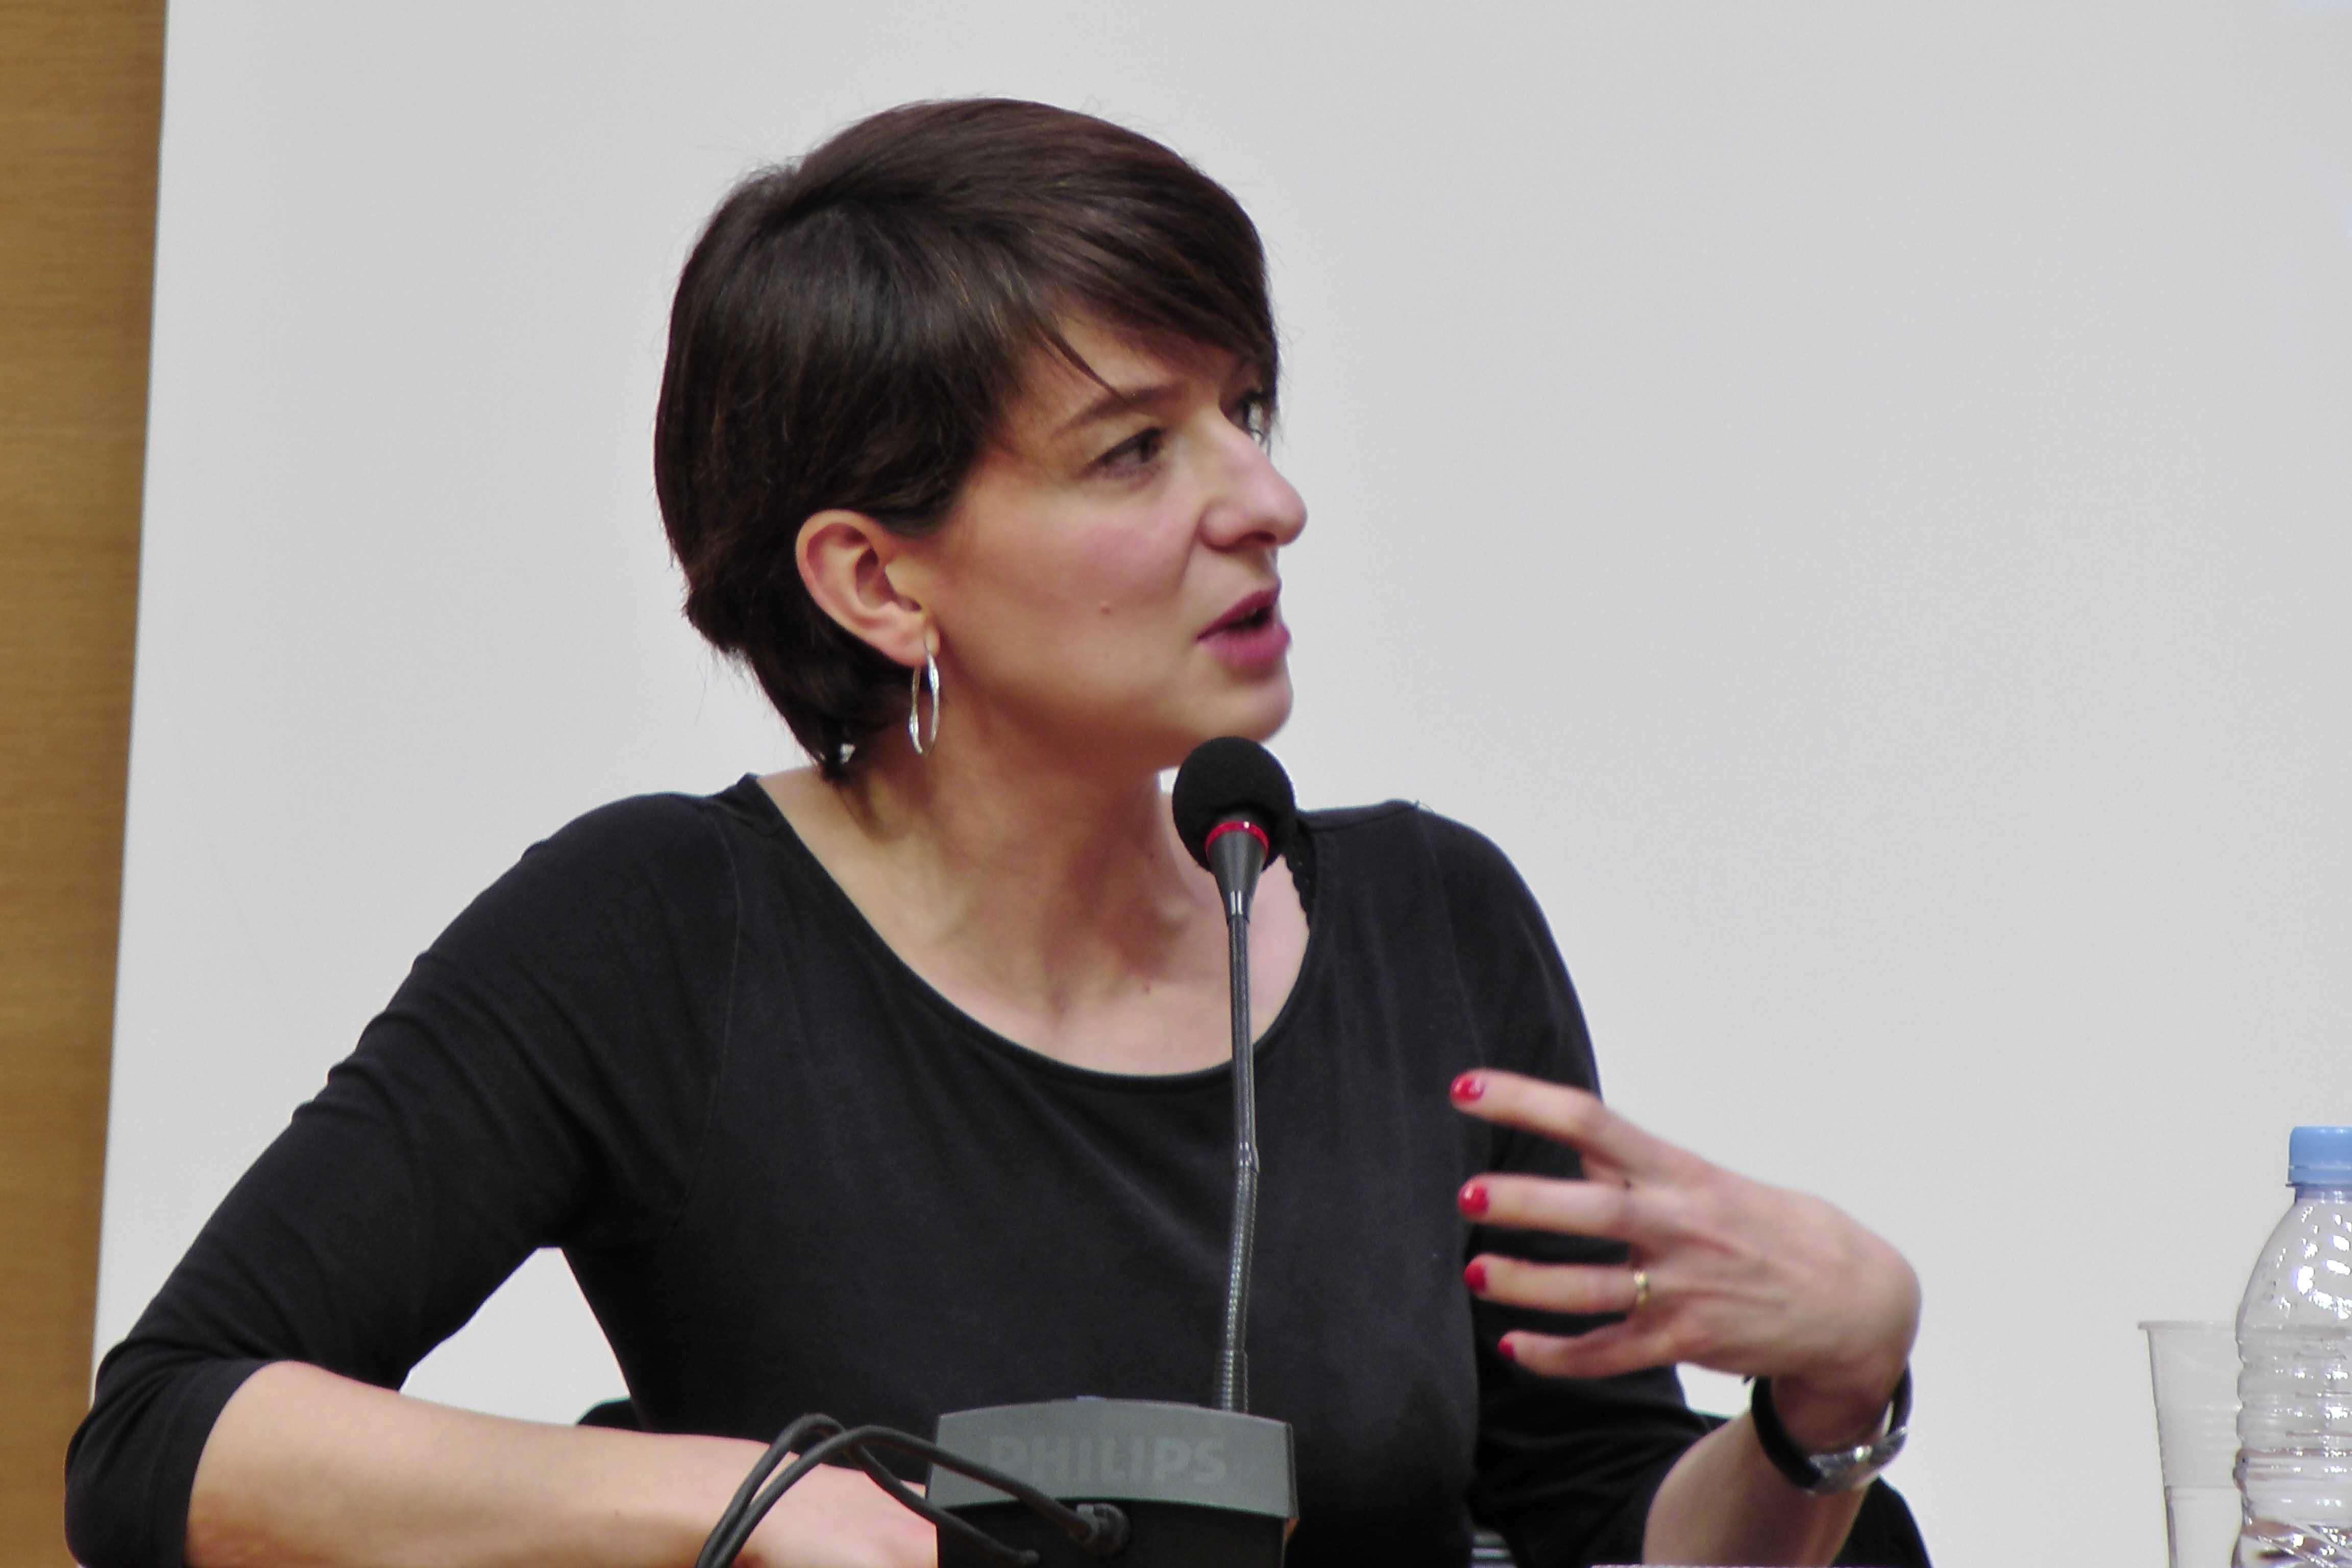 Séverine Kodjo-Grandvaux au Collège de France, source : vagabondssanstreves.com